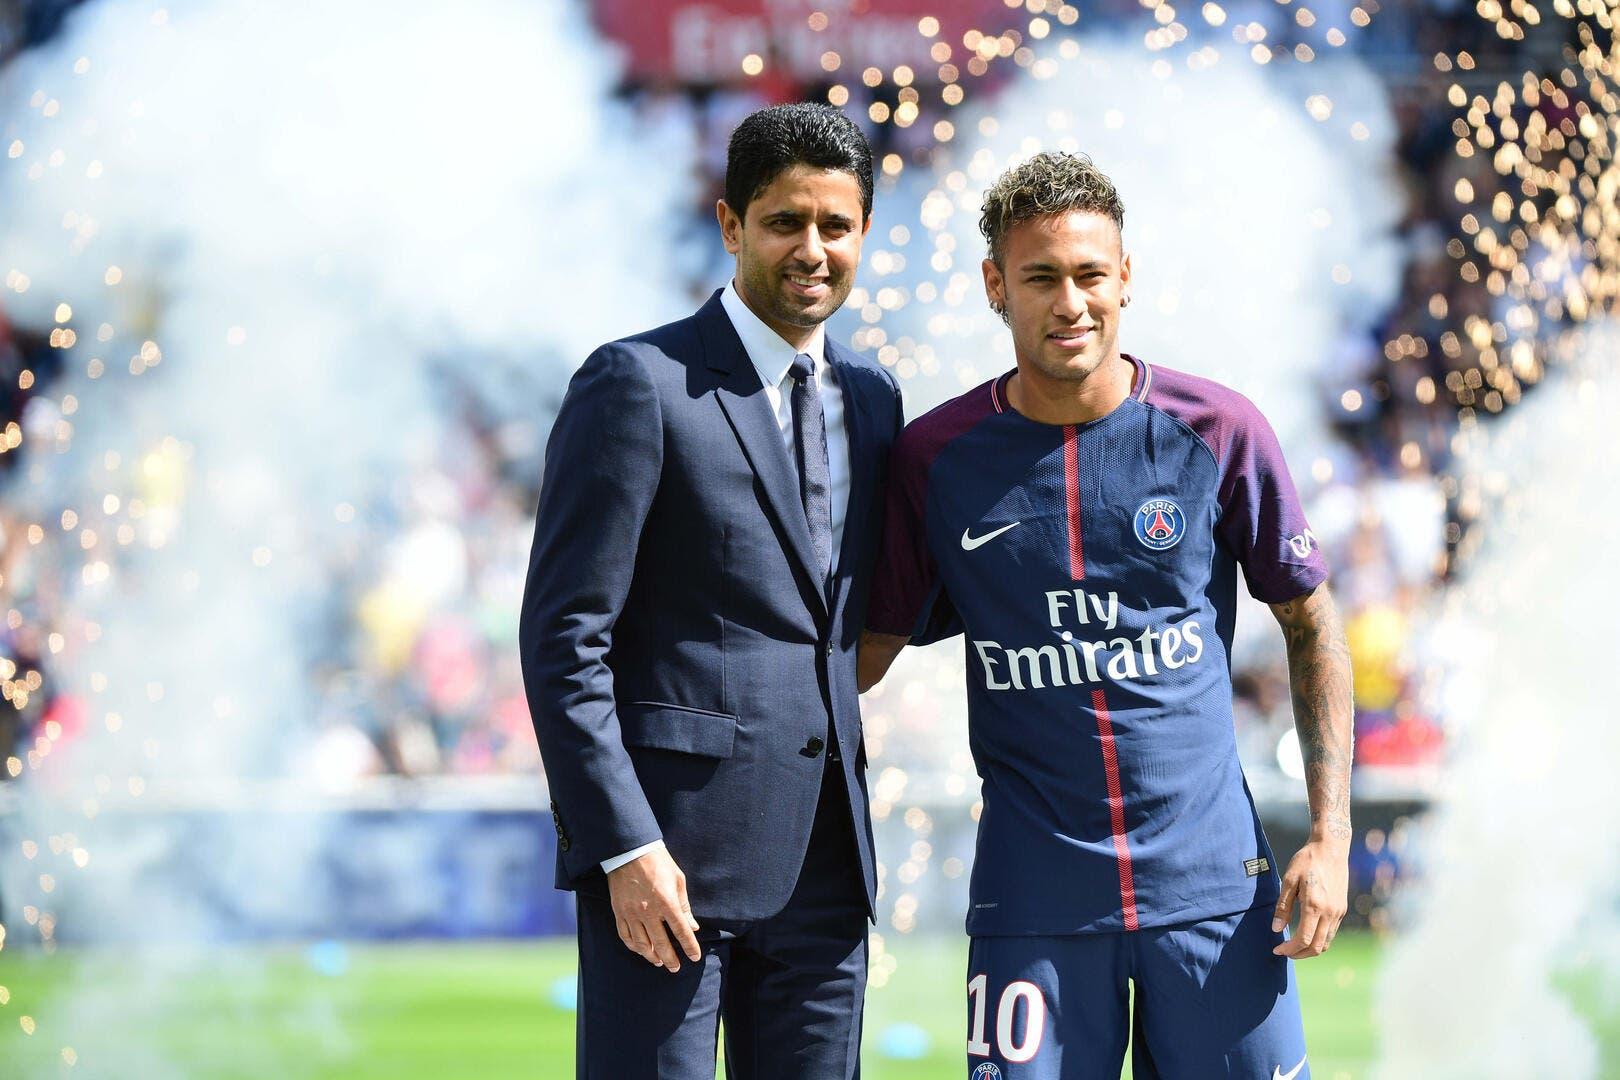 PSG : Ce que Nasser Al-Khelaïfi pense vraiment de Neymar